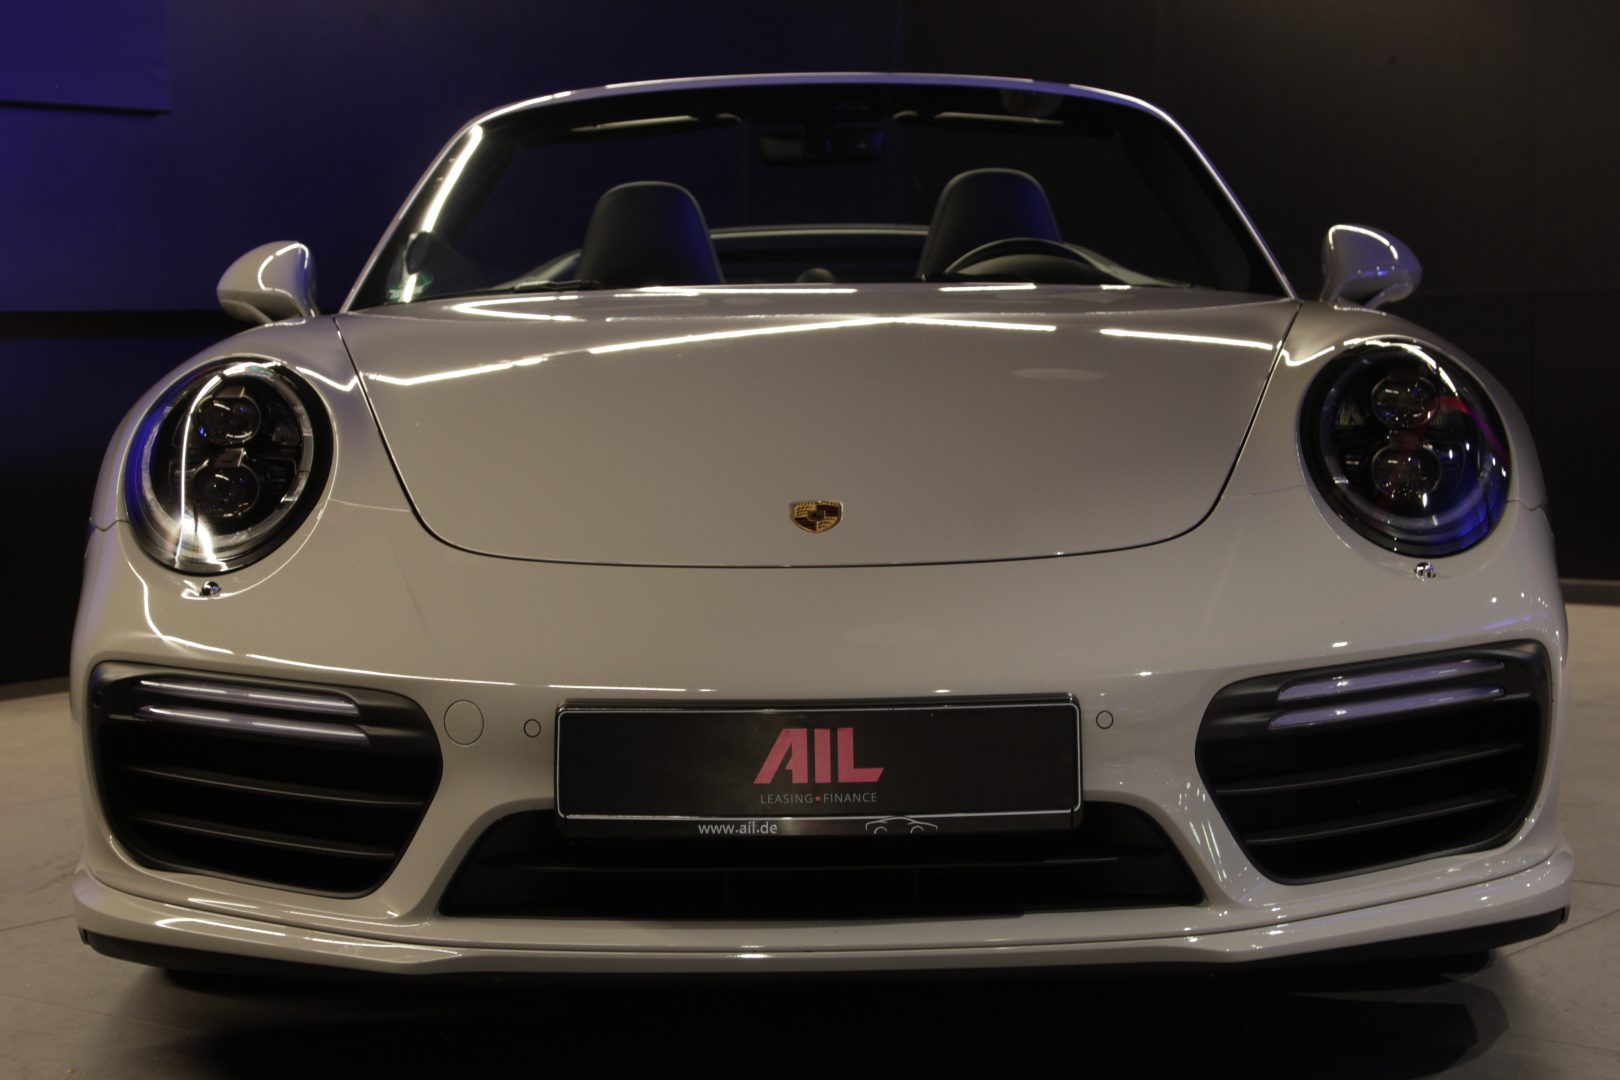 AIL Porsche 991 Turbo S Cabriolet 10